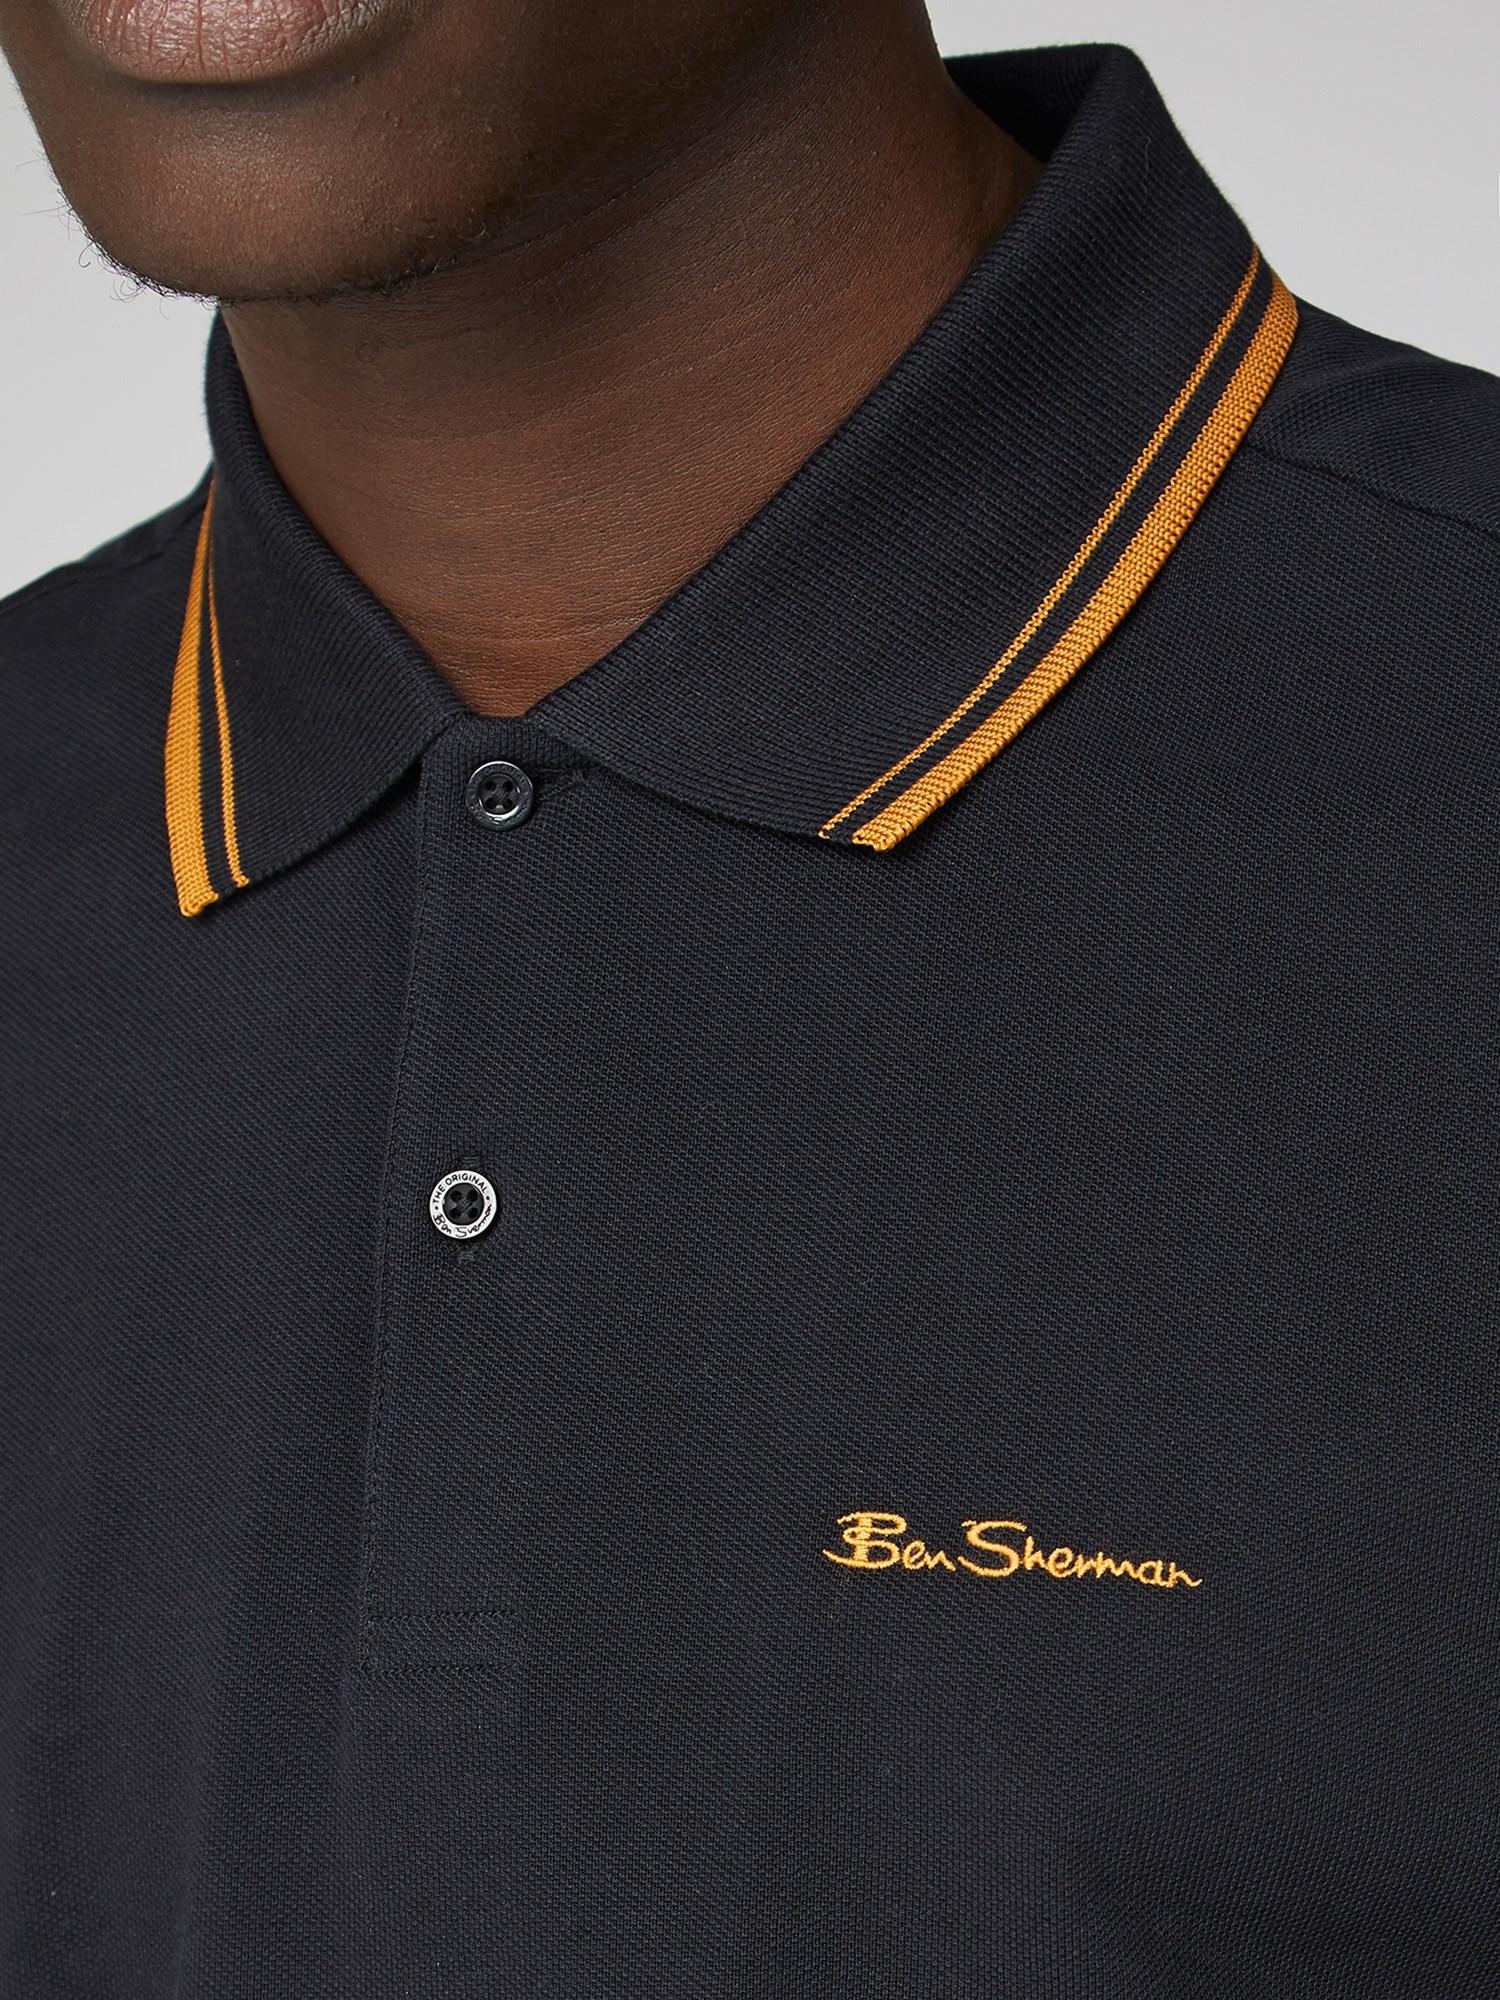 Black & Yellow Romford Tipped Polo Shirt